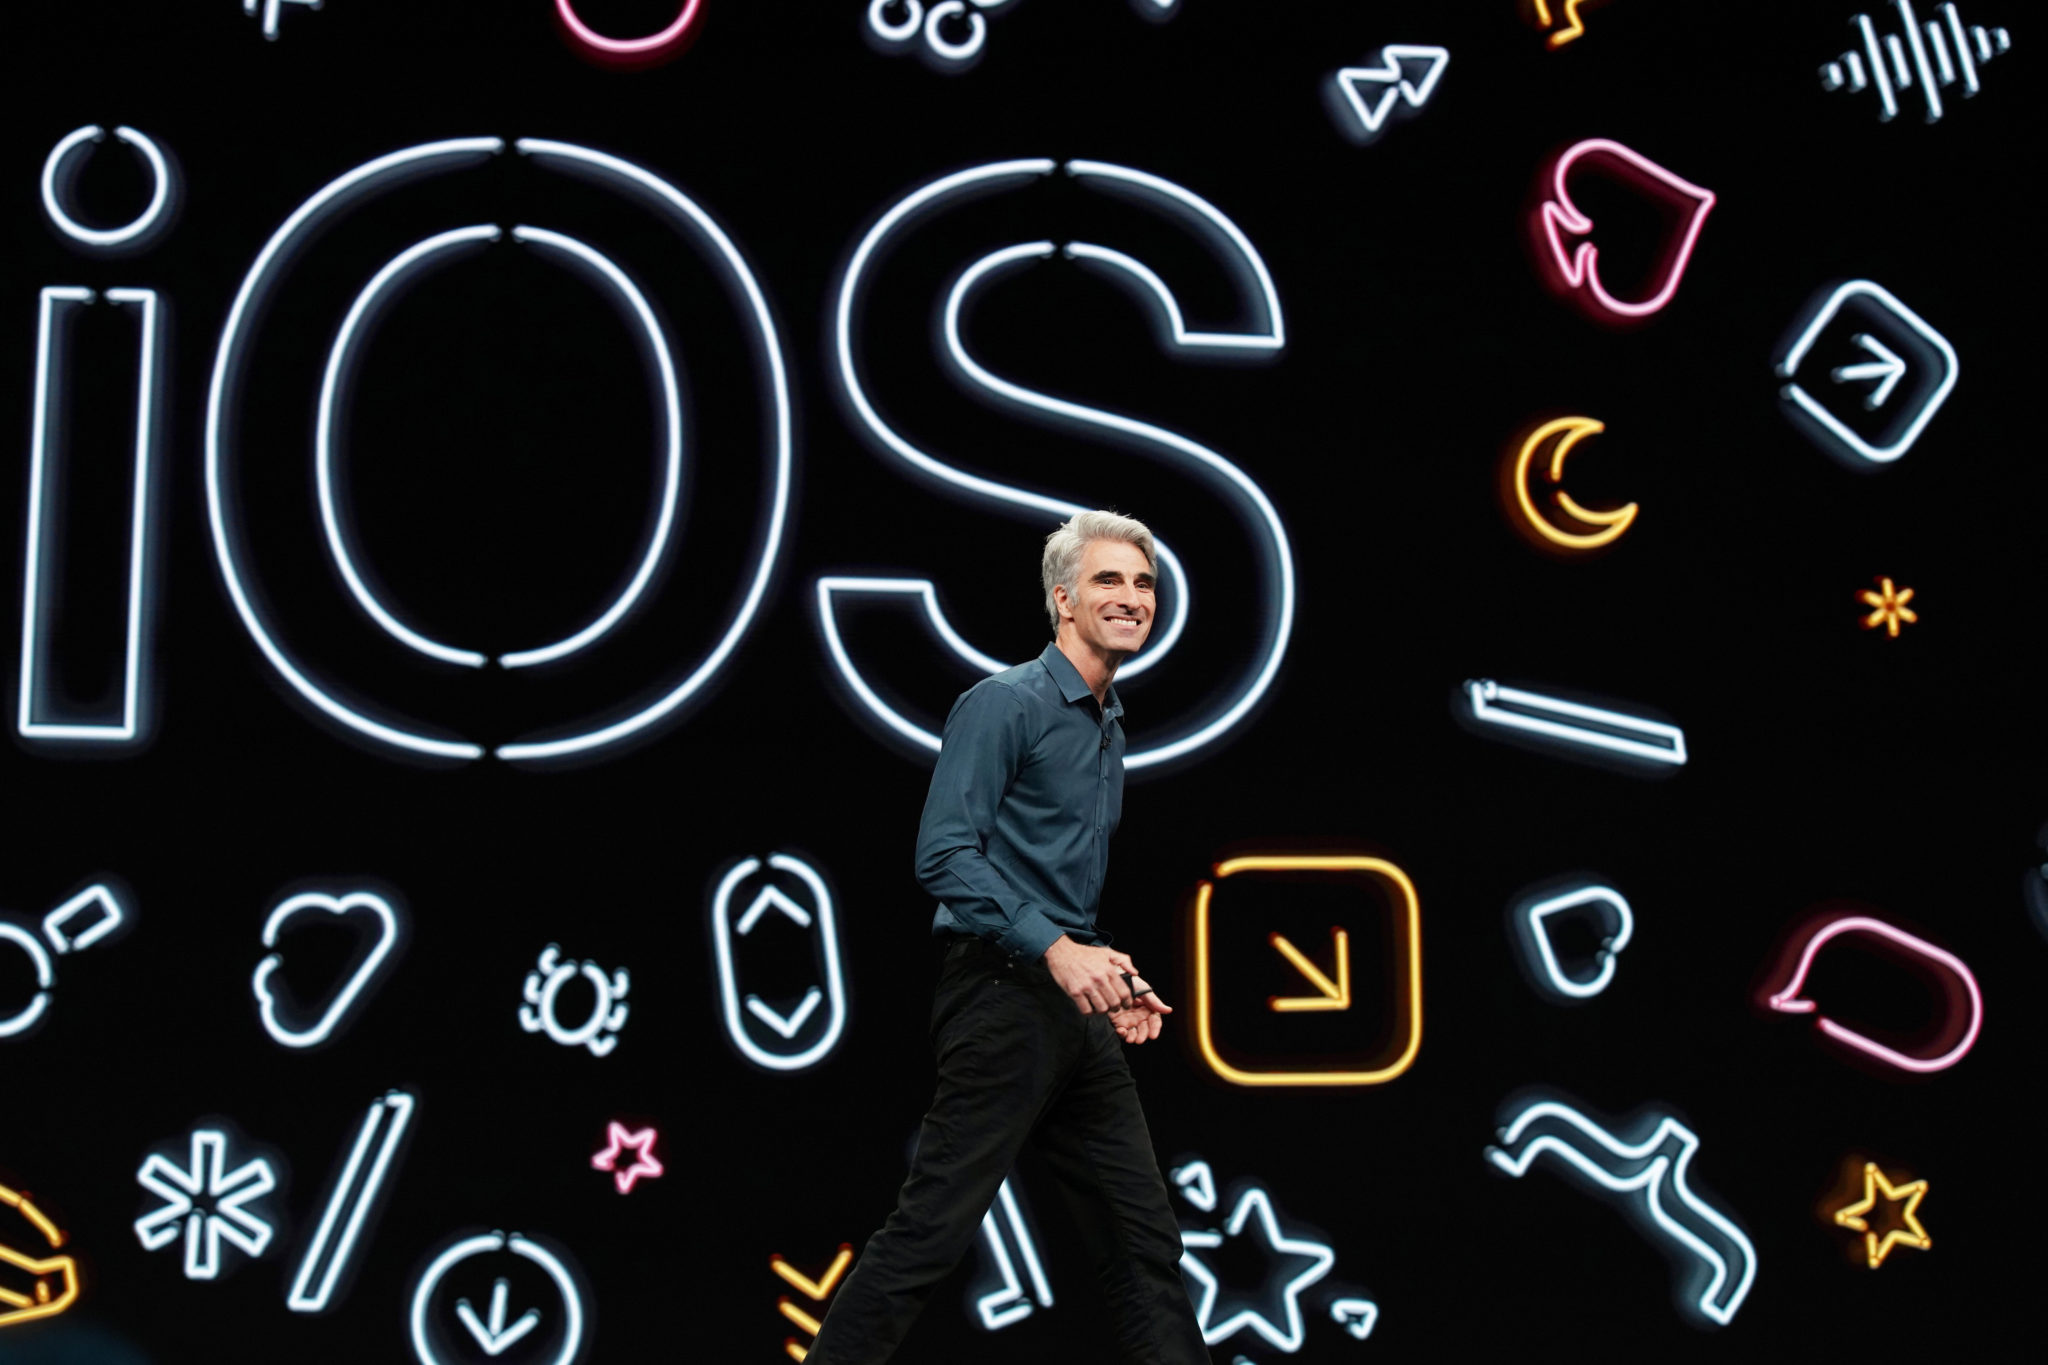 Apple S Keynote At Wwdc 2019 Rockit Tech Marketing